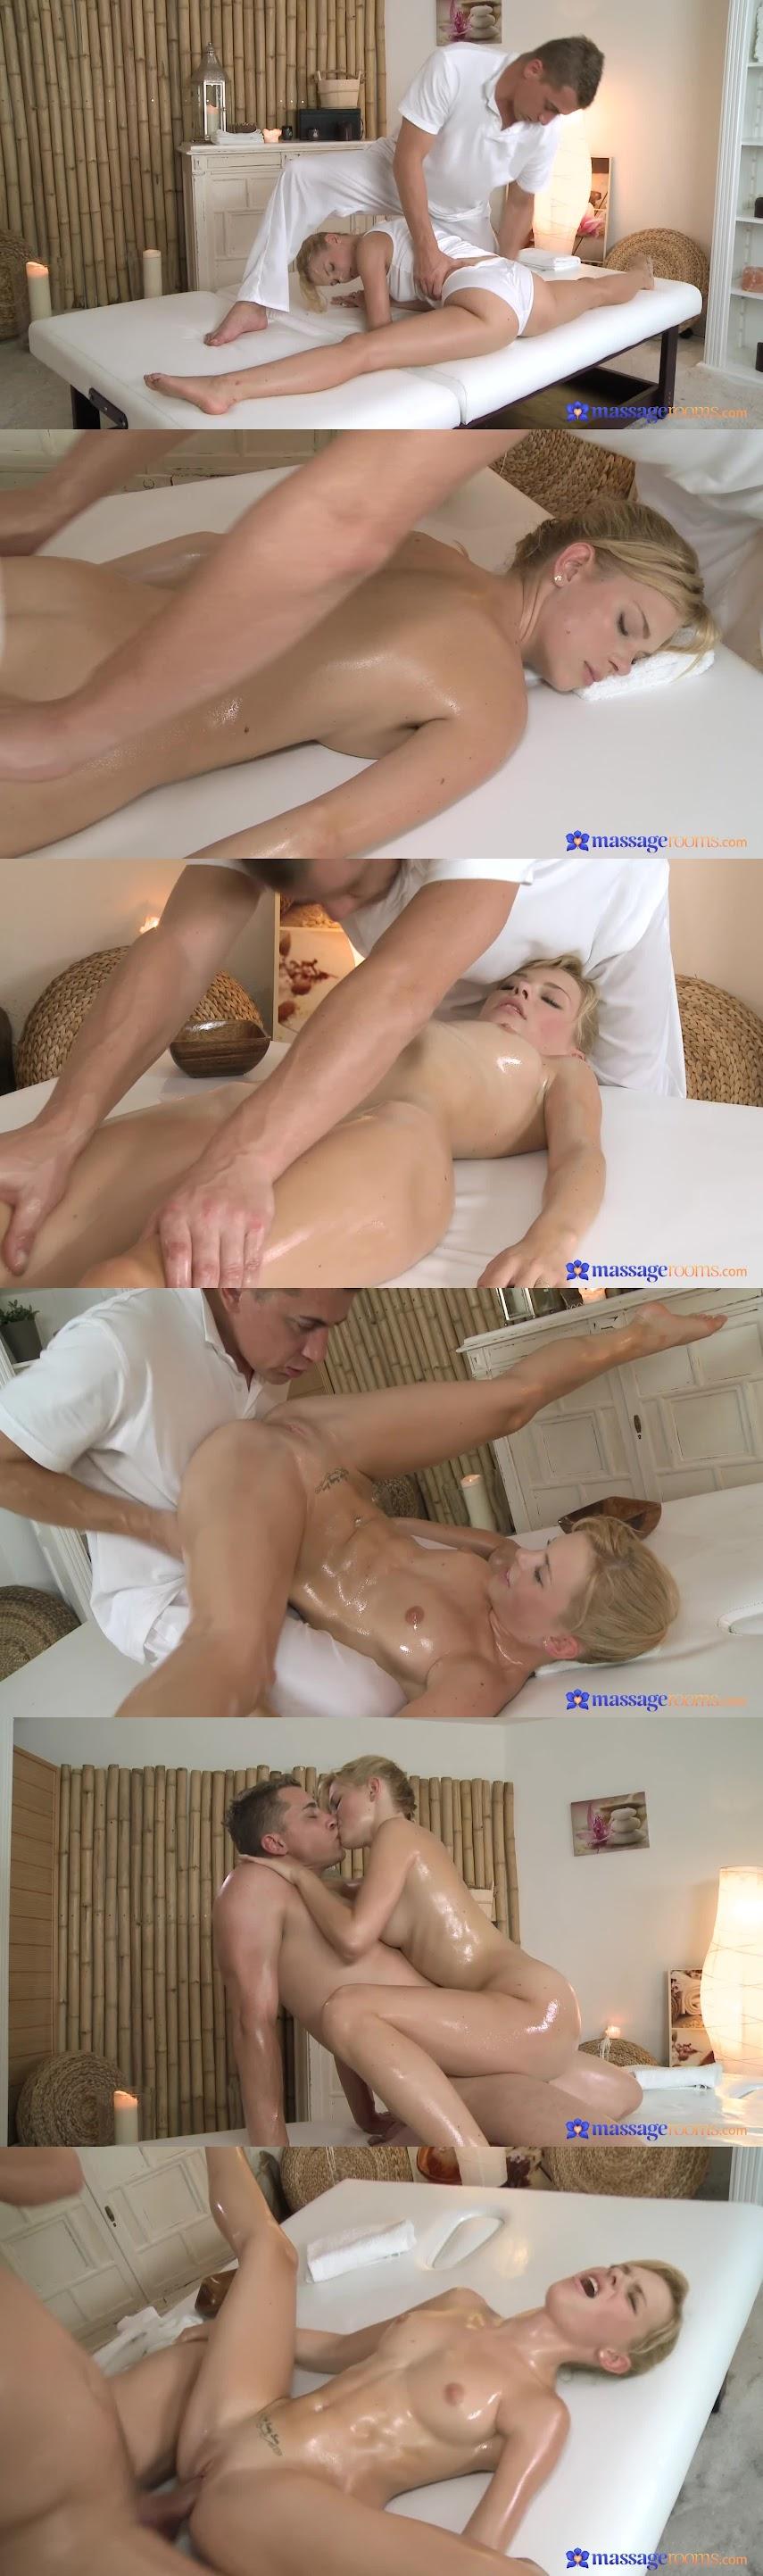 sexyhub.14.09.30.flexible-ballerina-pirouettes-onto-masseur-s-cock